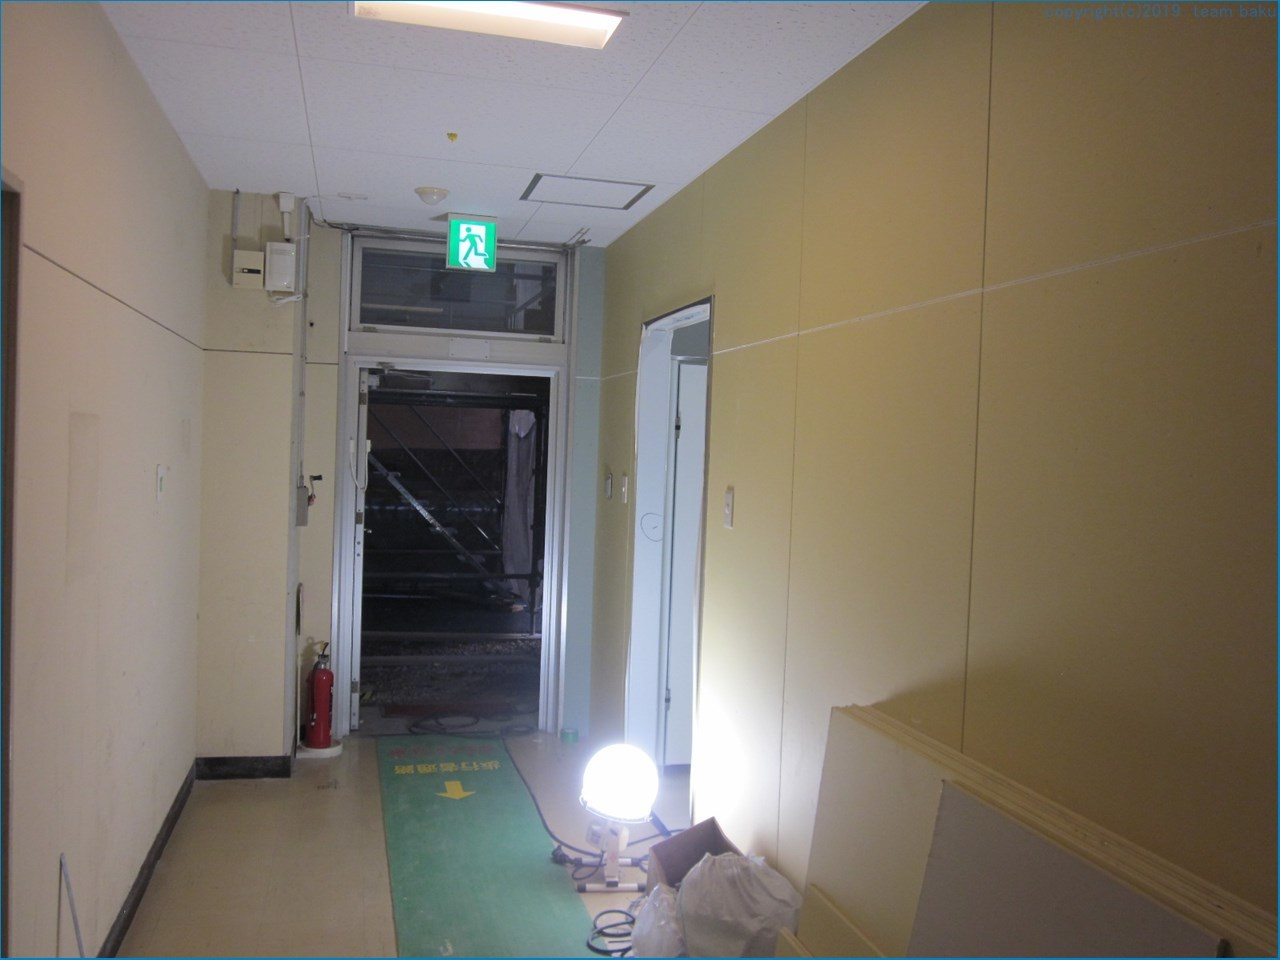 N病院グループ Nナーシング南館 改修・増築工事 1_c0376508_03420490.jpg